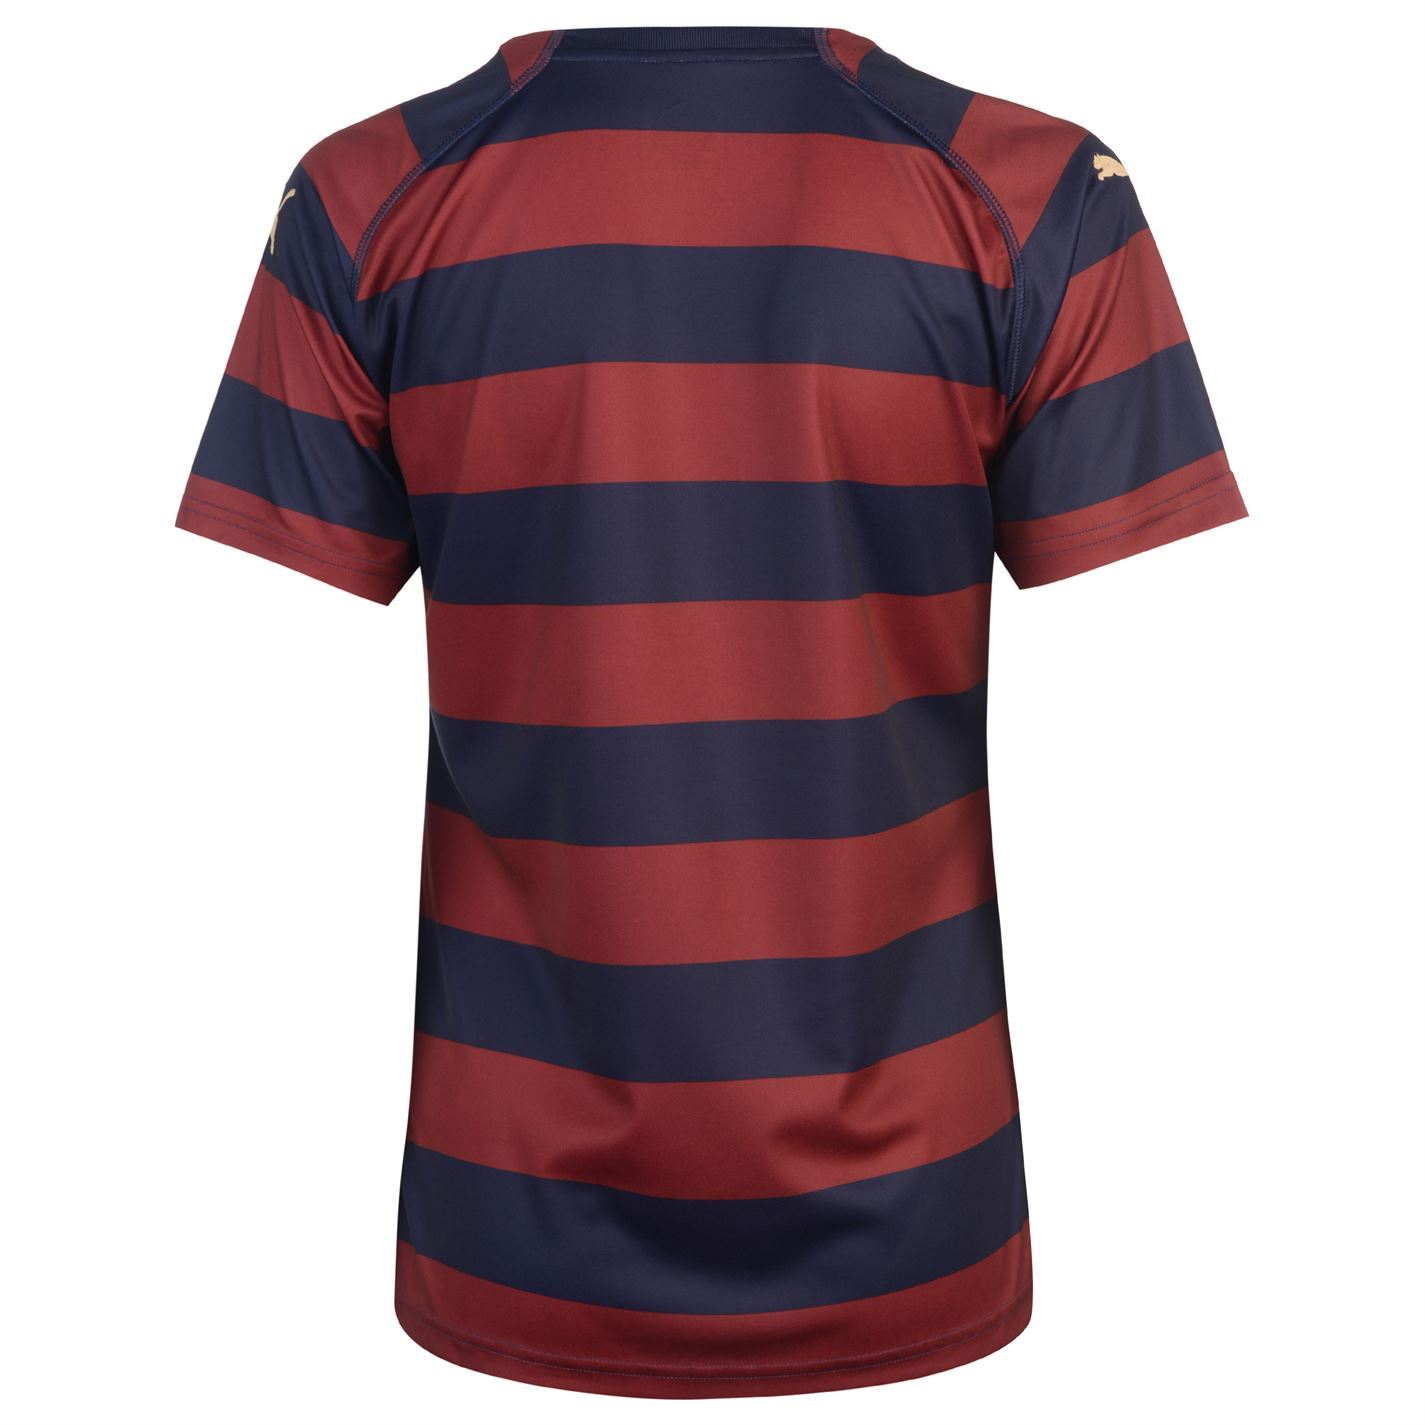 ... Puma Newcastle United Away Jersey 2018 19 Womens Navy Football Soccer  Shirt Top ... 9604b8c9f